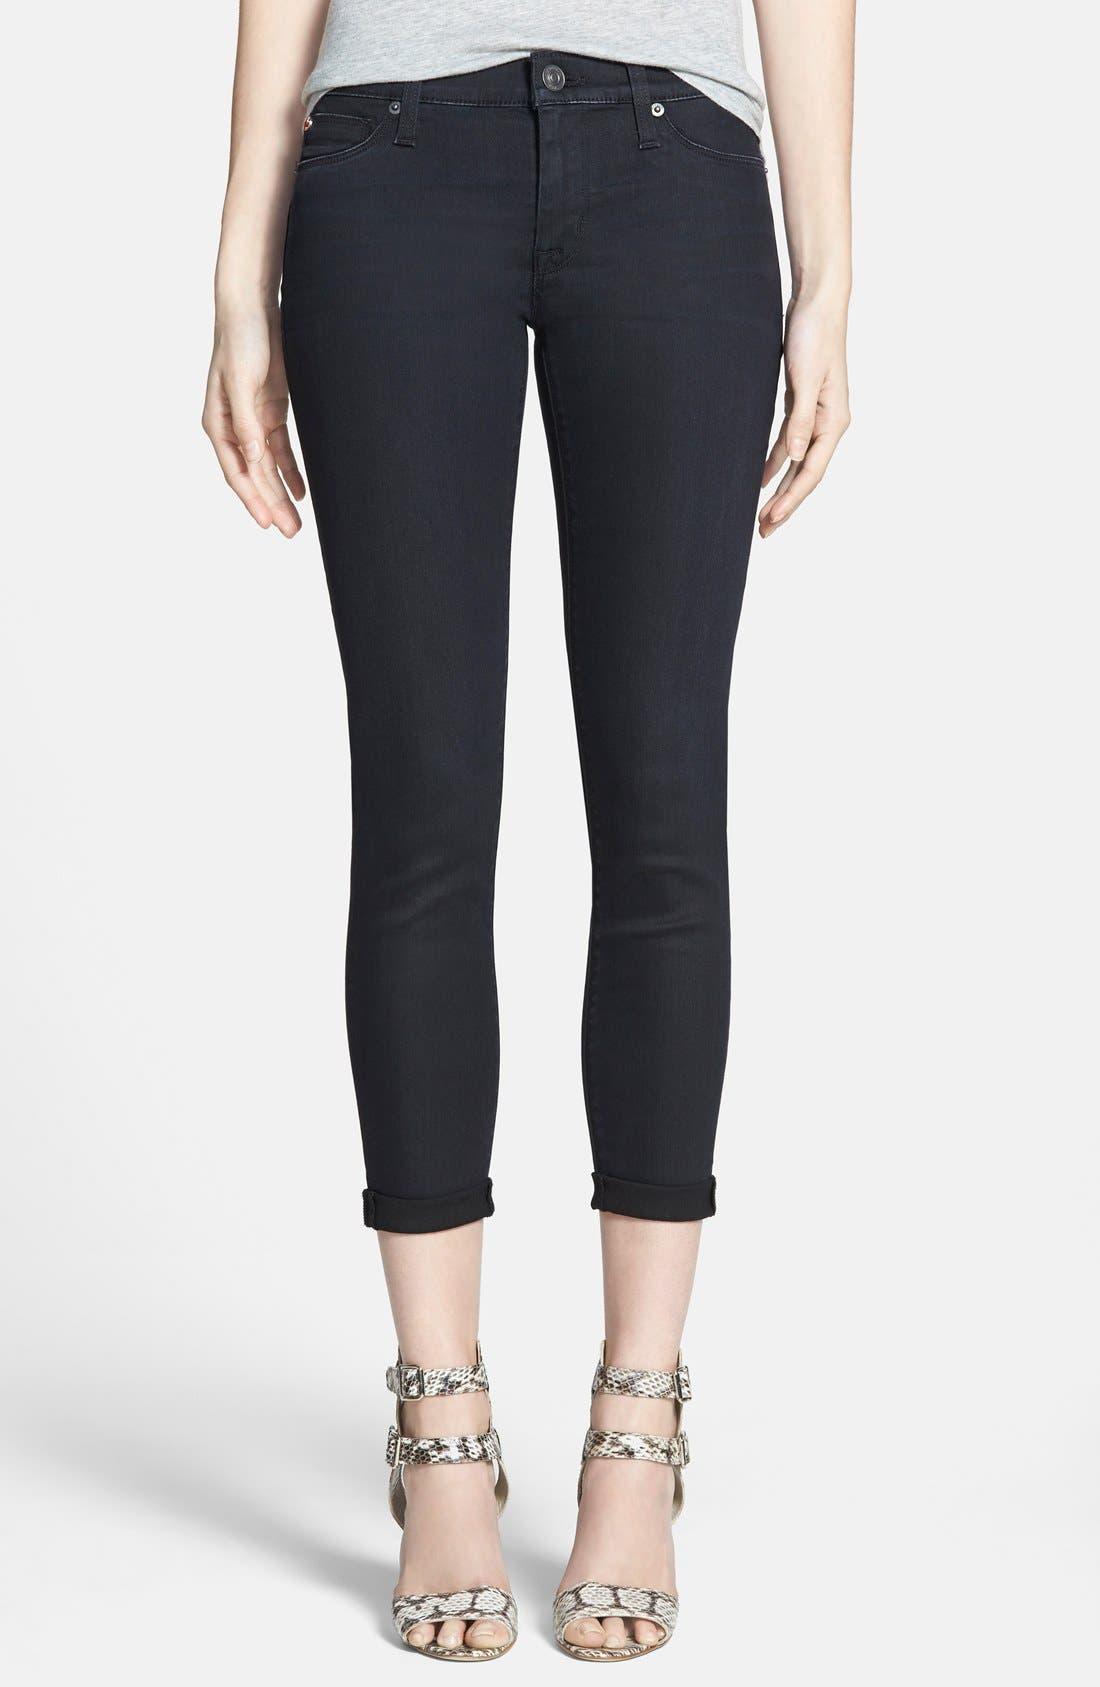 Alternate Image 1 Selected - Hudson Jeans 'Harkin' Skinny Jeans (Shrine)